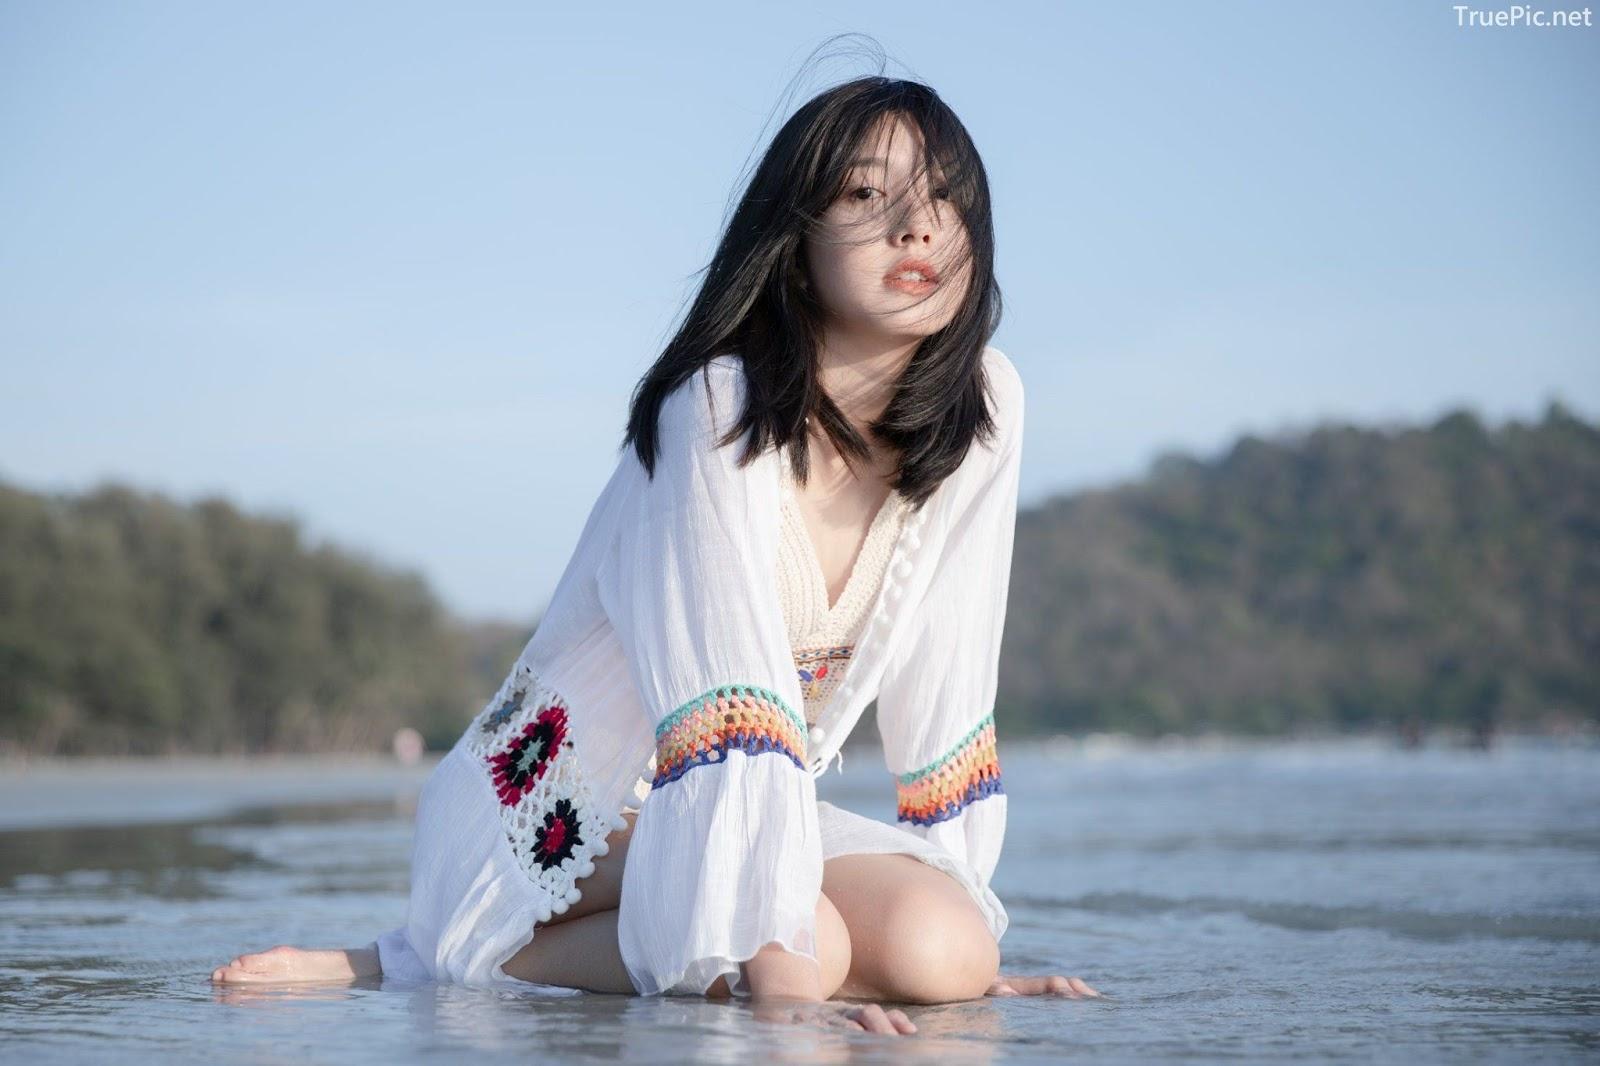 Thailand hot girl Purewarin Kosiriwalanon - Pure beauty and lovely with wool bikini - Picture 6